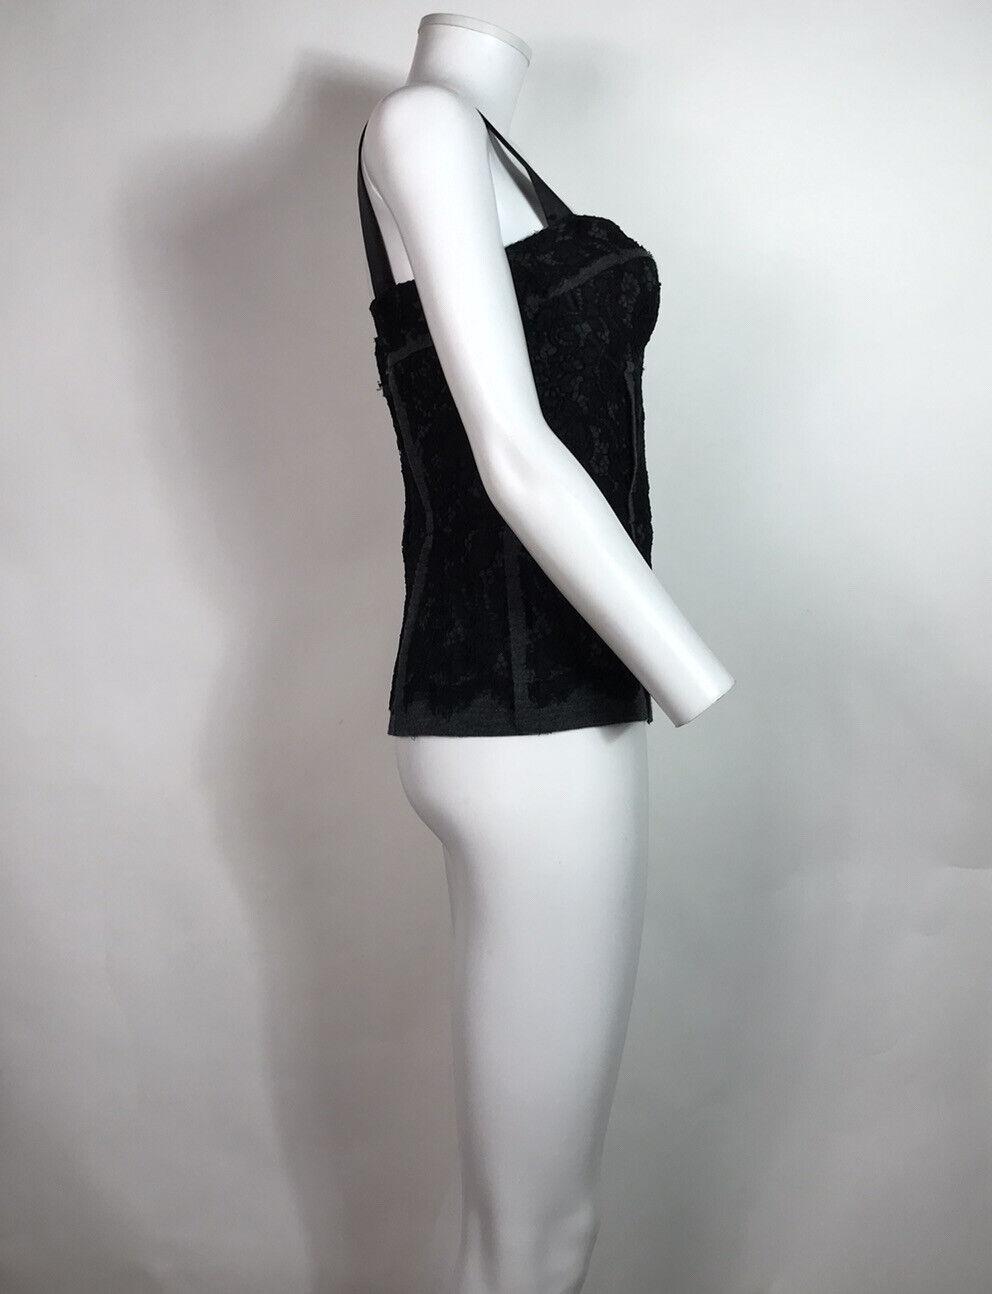 Rare Vtg Dolce & Gabbana Black Lace Corset Top L - image 4